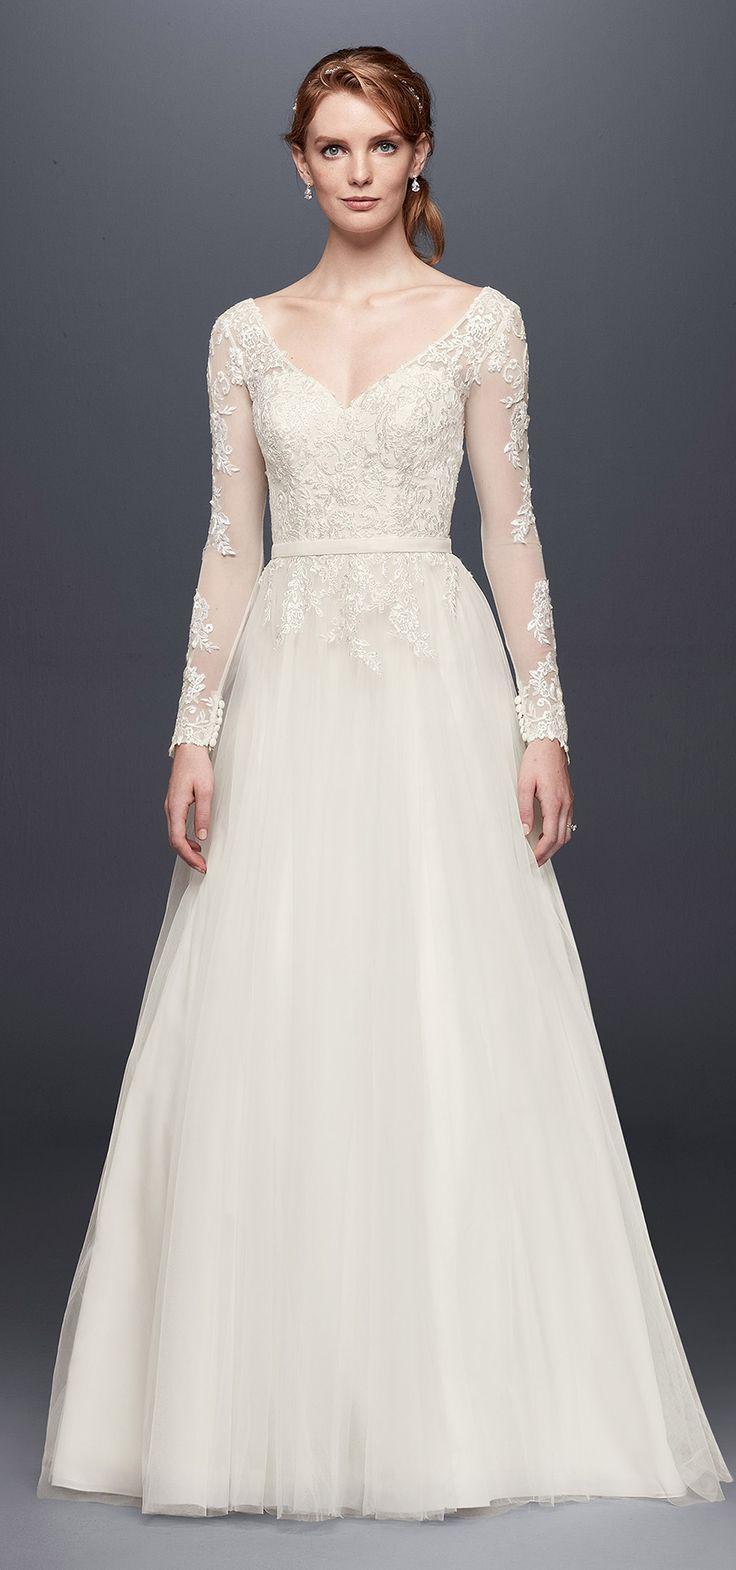 Long Sleeve Wedding Dress With Low Back | David's Bridal Spring 2017 @davidsbridal #davidsbridal #ad #wedding #weddingdress #sleeves